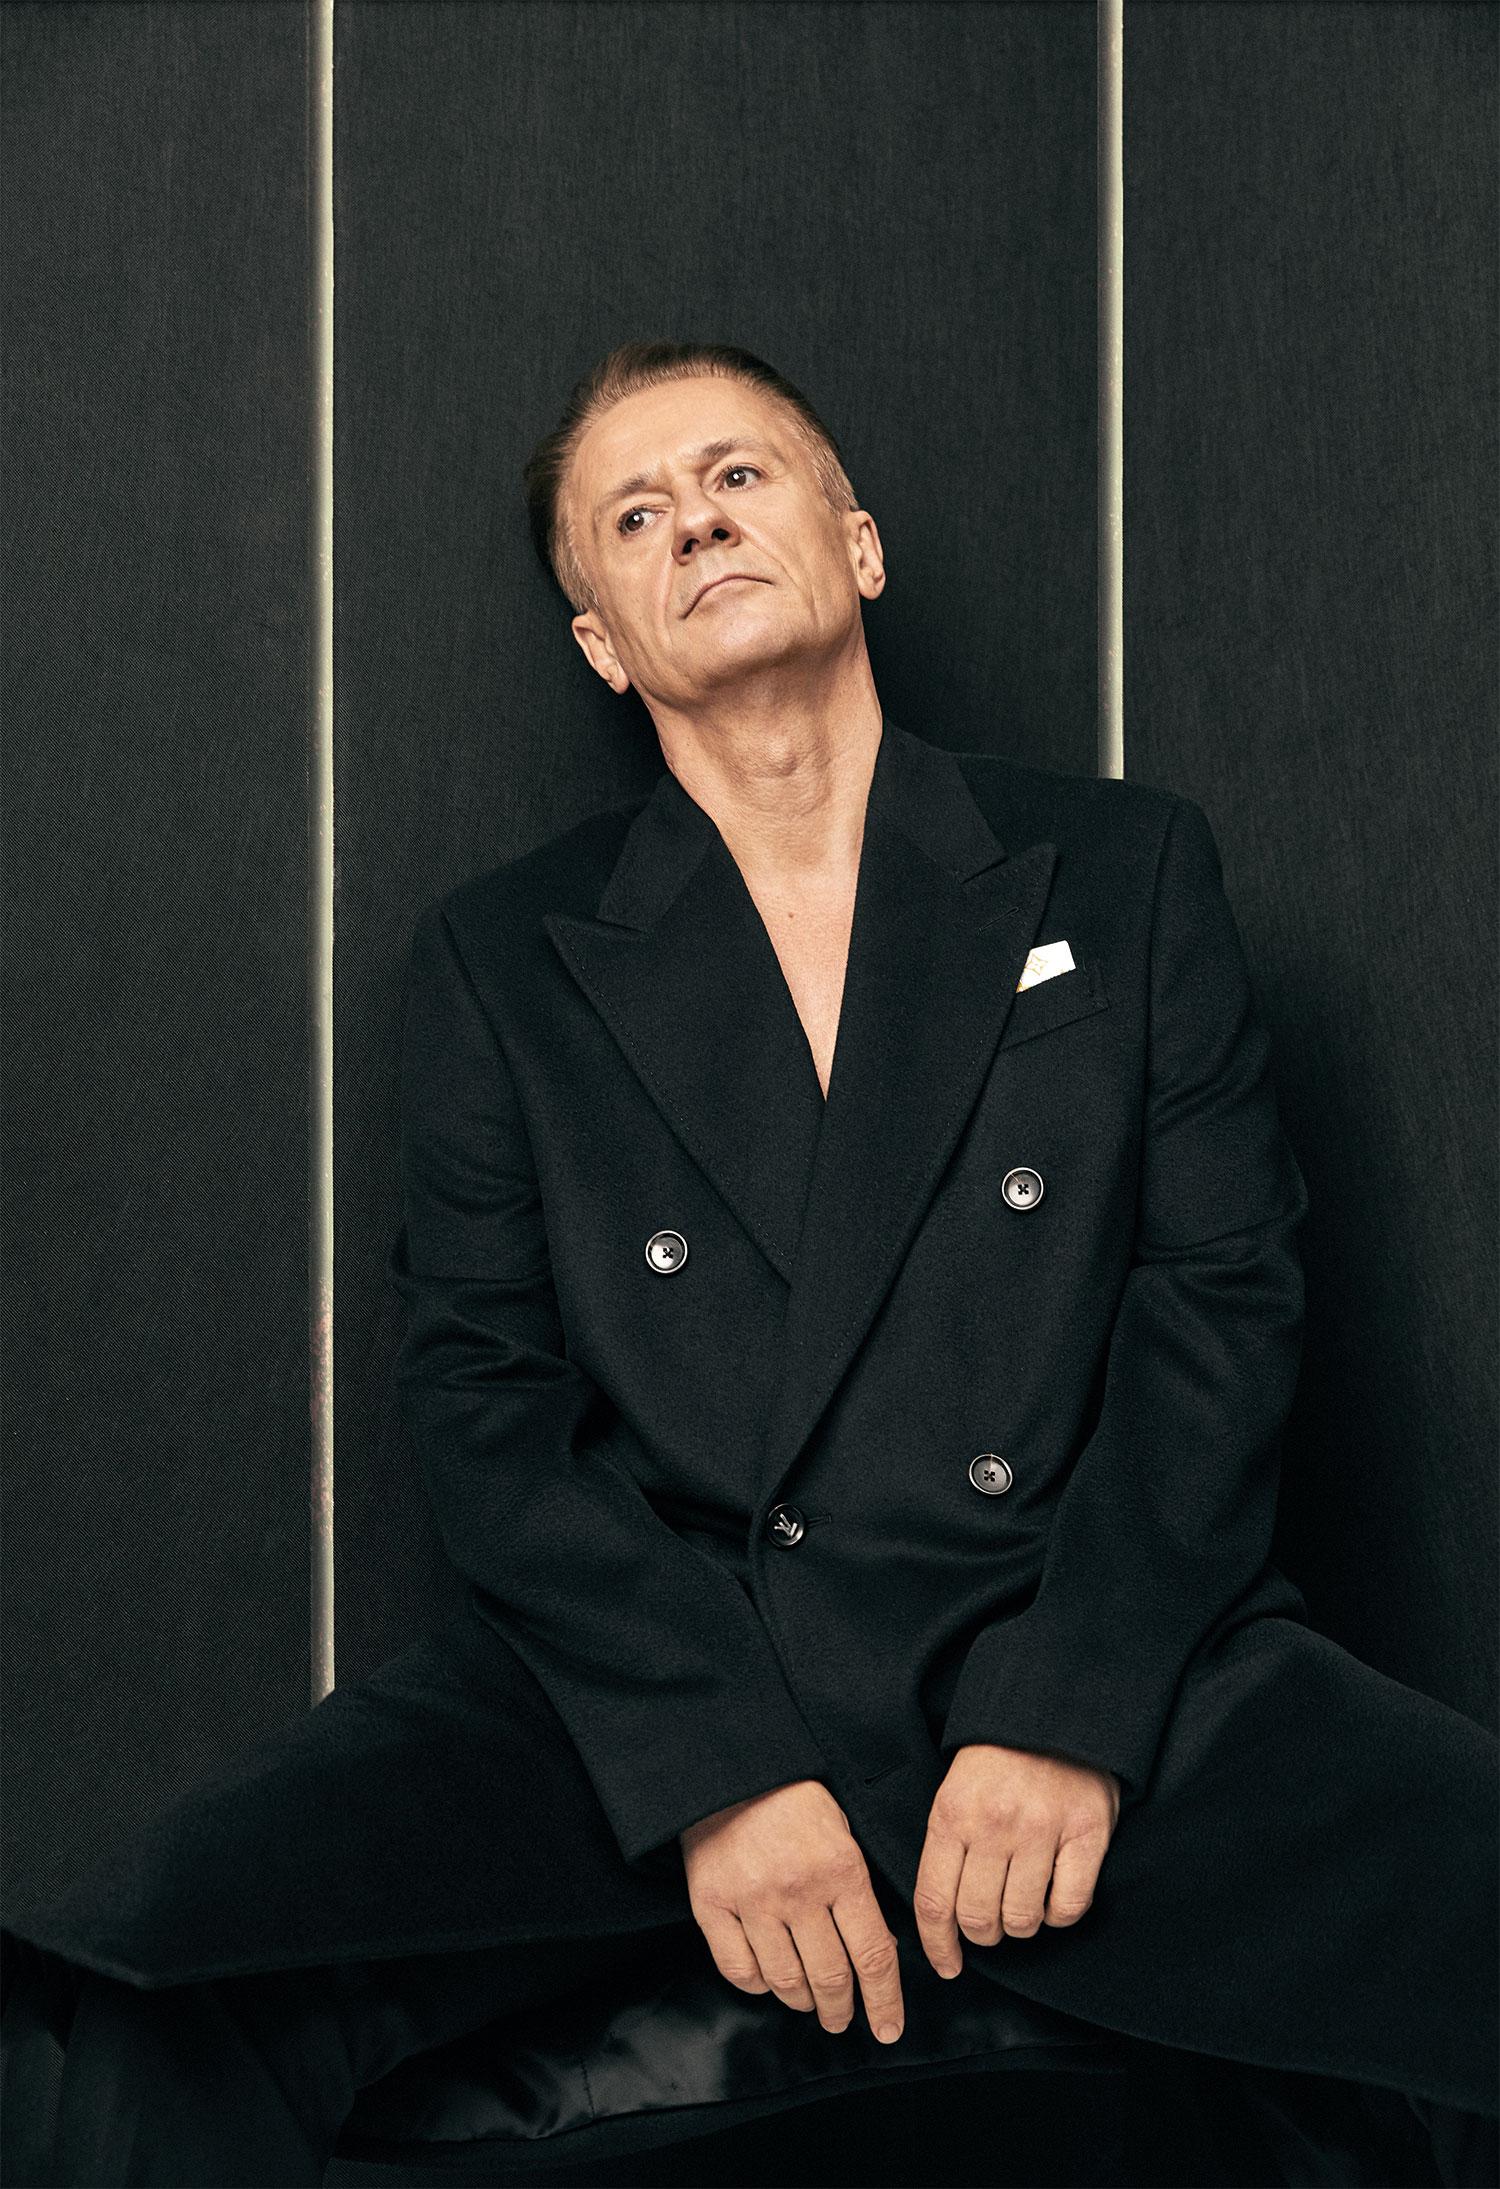 Пальто Louis Vuitton; брюки Canali